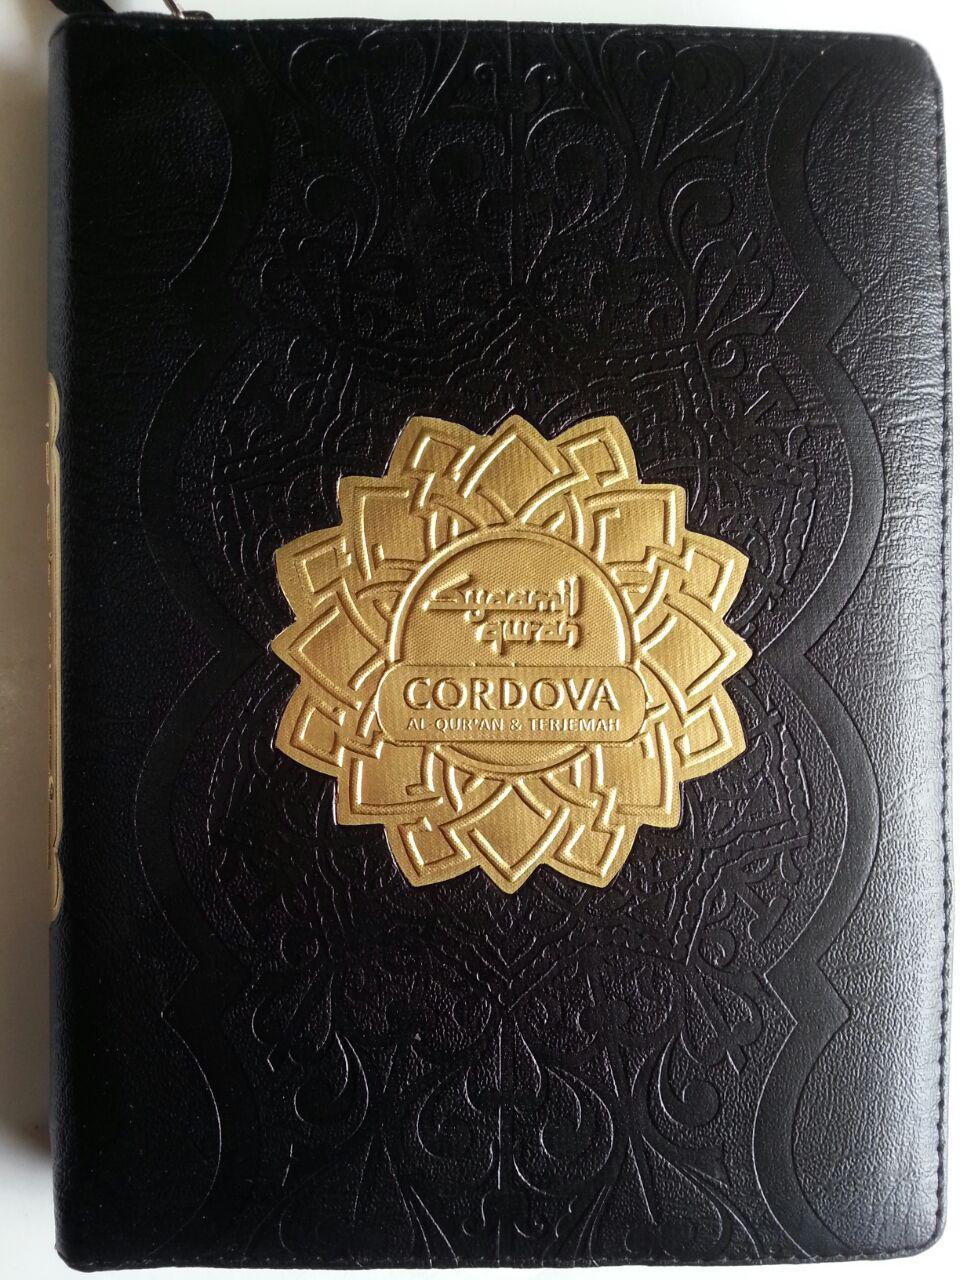 Al-Qur'an Syaamil Terjemah Resleting Cordova Ukuran A5 cover